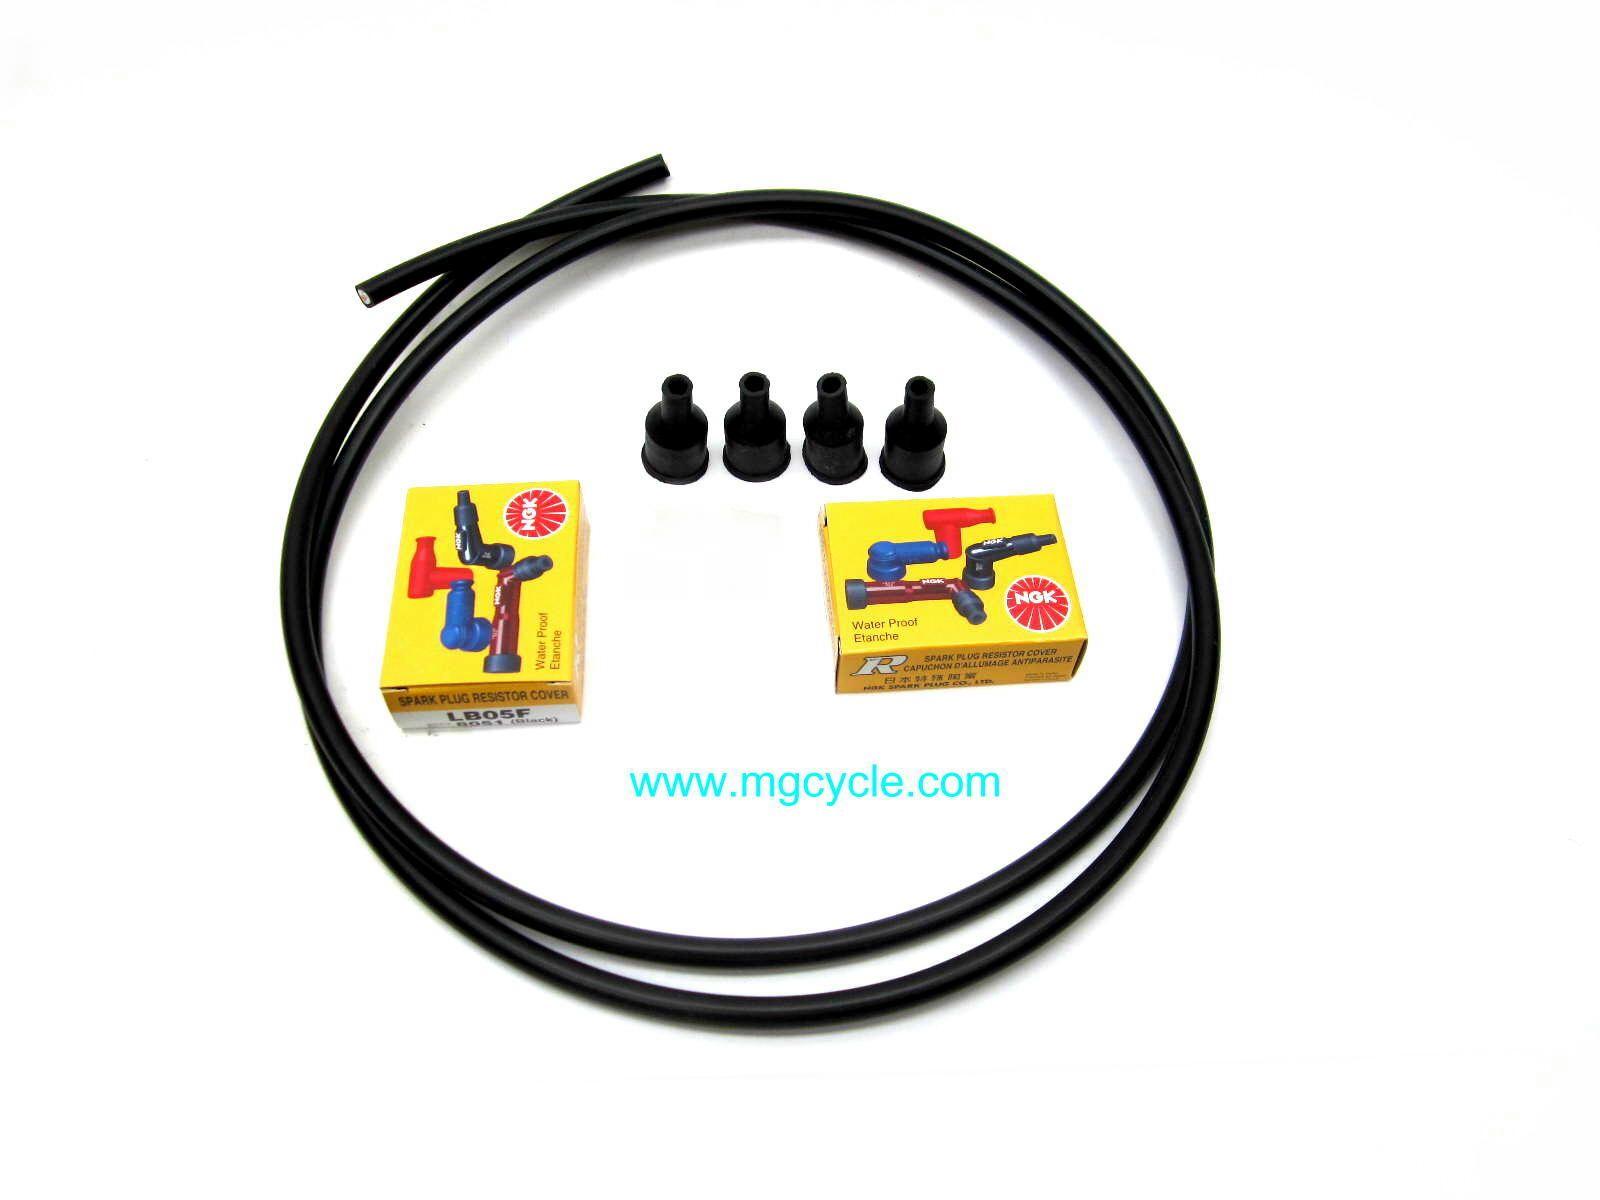 Ignition System Mg Cycle Moto Guzzi Parts And Accessories 1971 El Dorado Headlight Wiring Harness Wire Kit For V700 Ambassador Eldorado